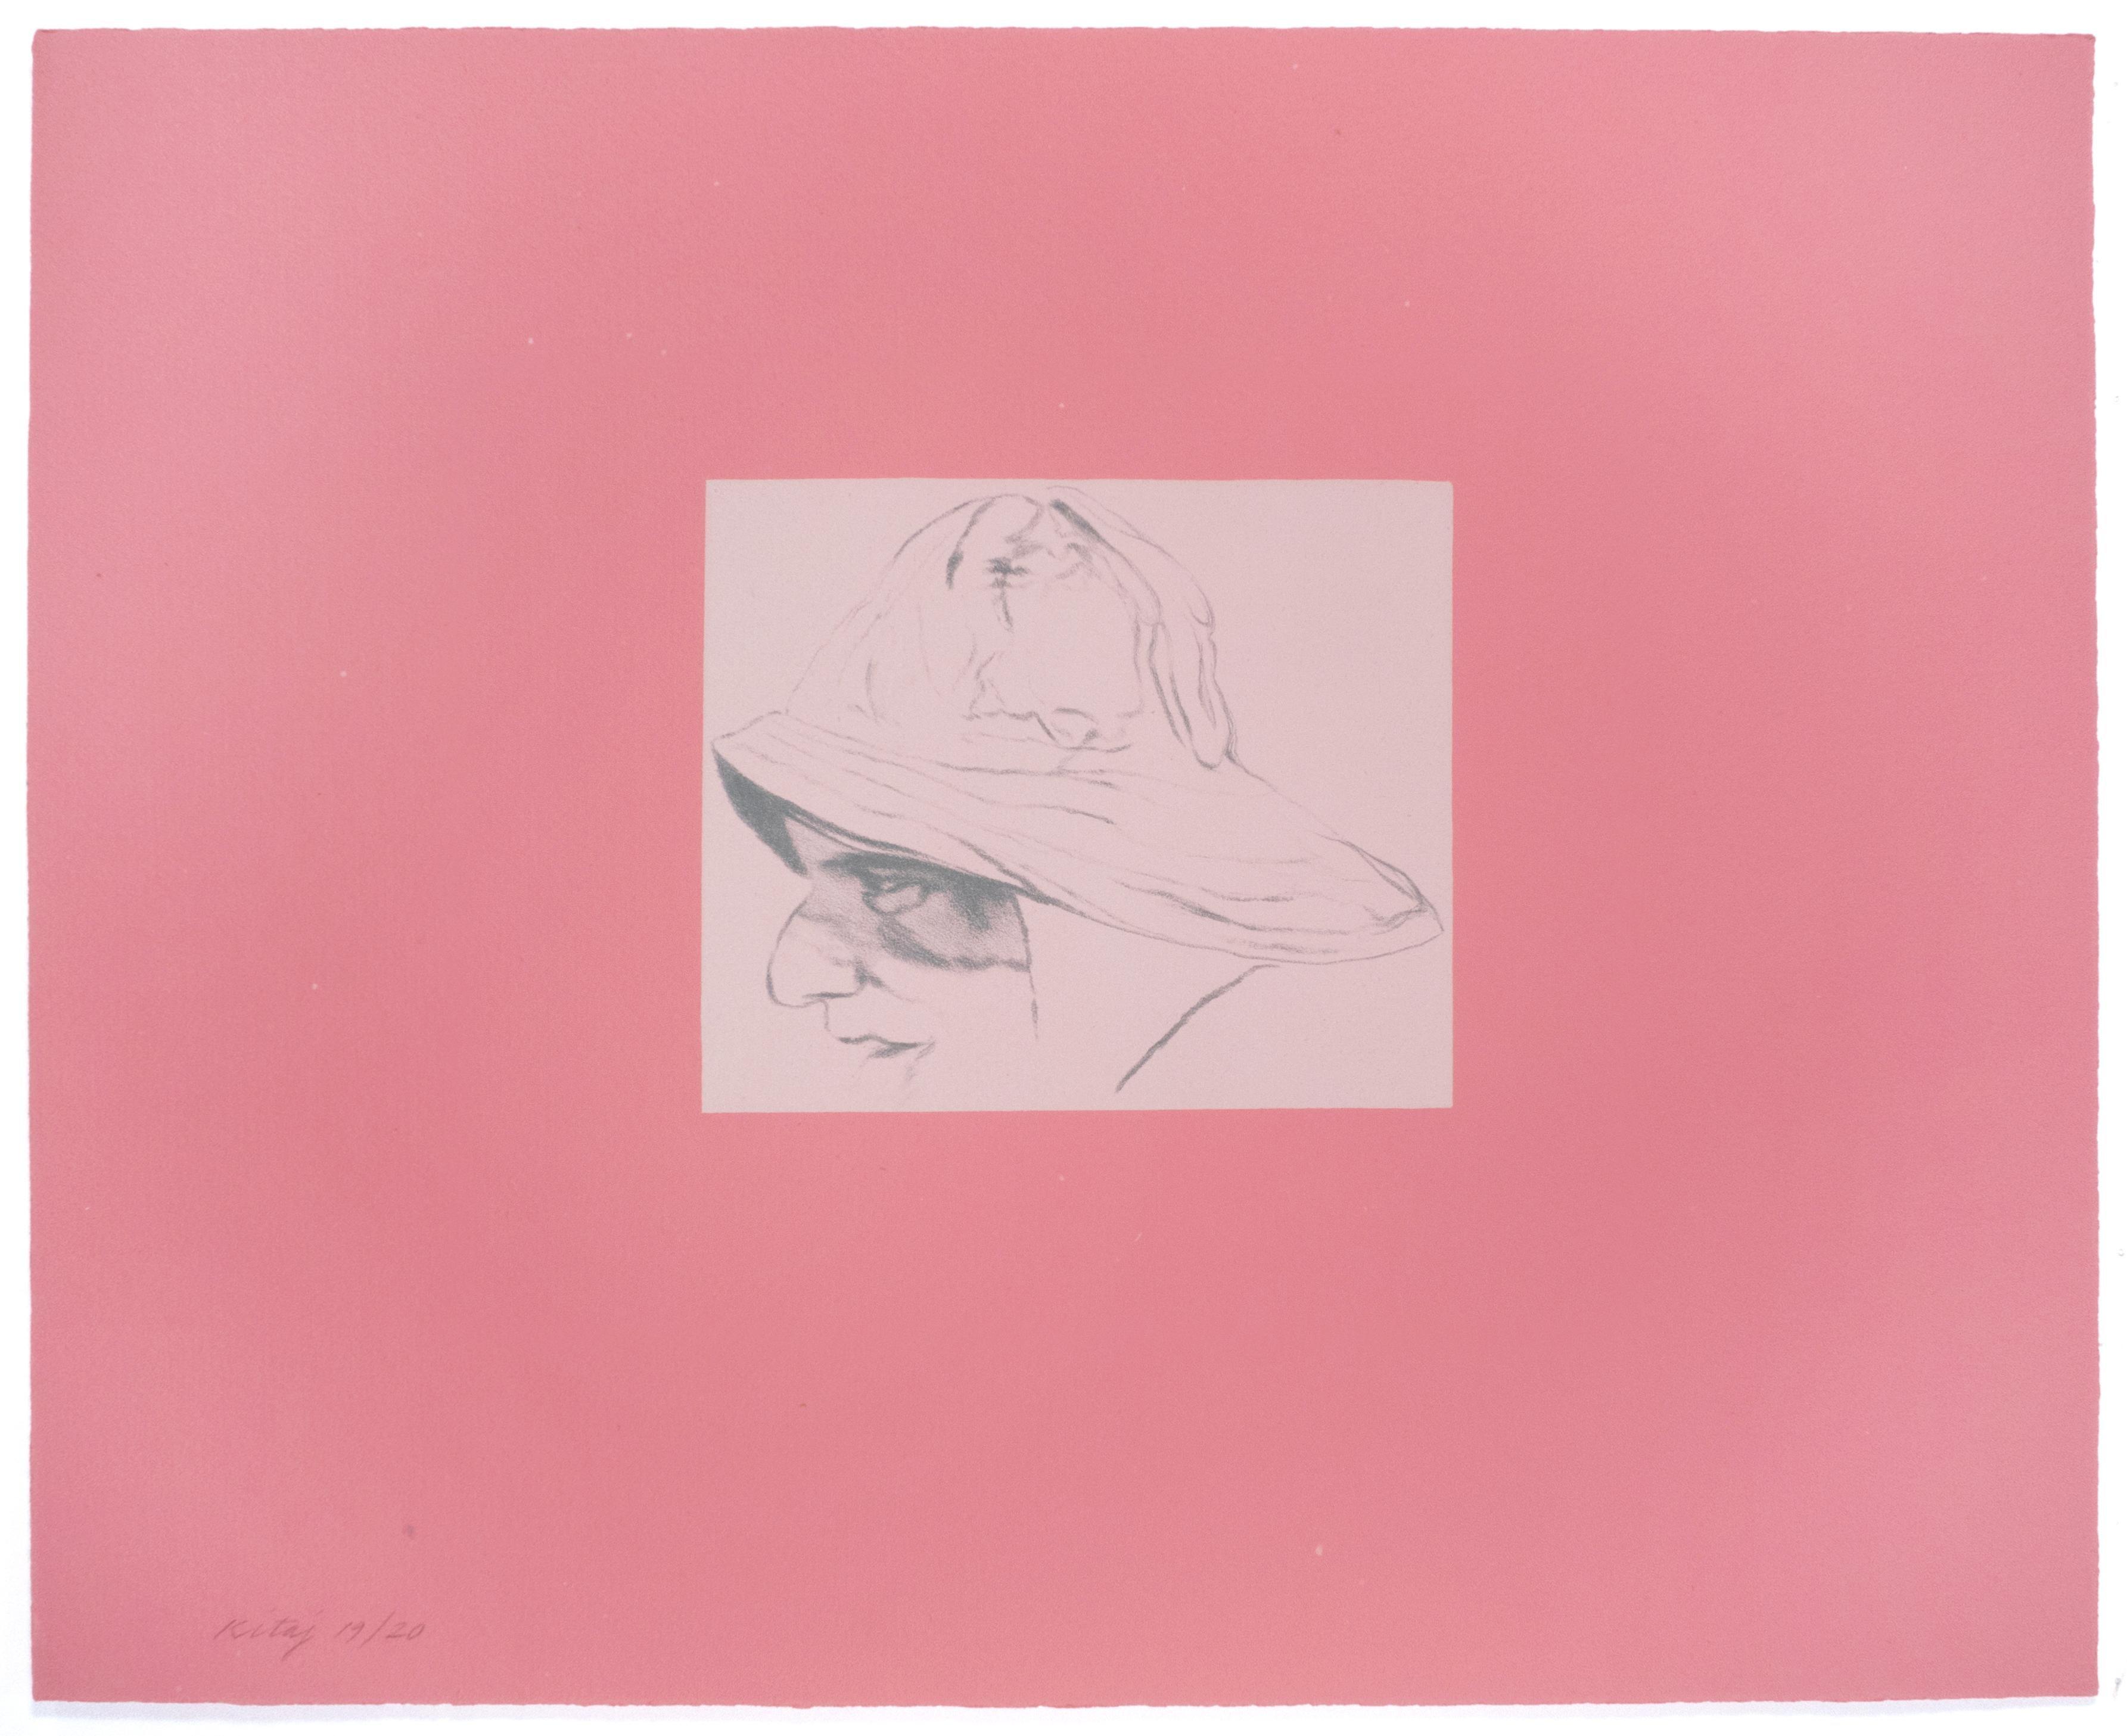 Cap'n A.B. Dick: Pale pink and raspberry sailor's portrait drawing by R.B. Kitaj